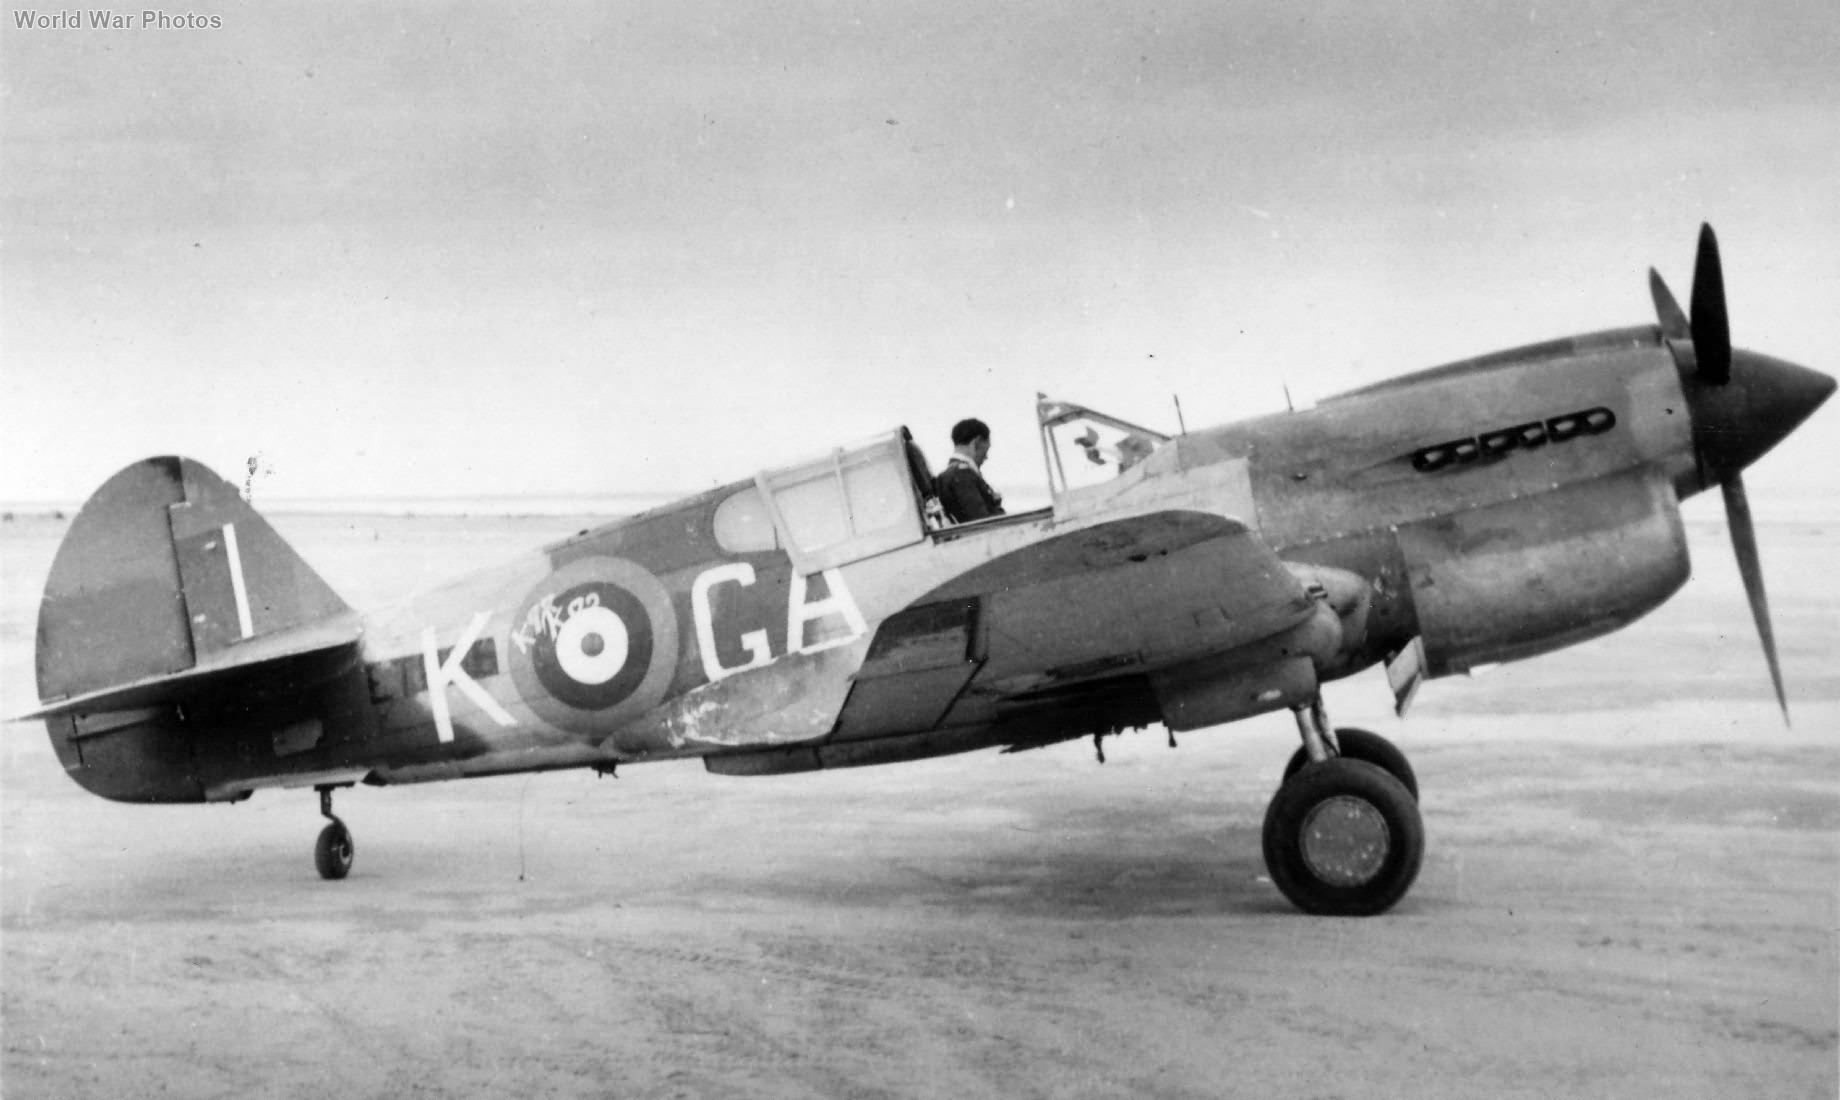 Kittyhawk Mk IA GA-K of No. 112 Squadron RAF